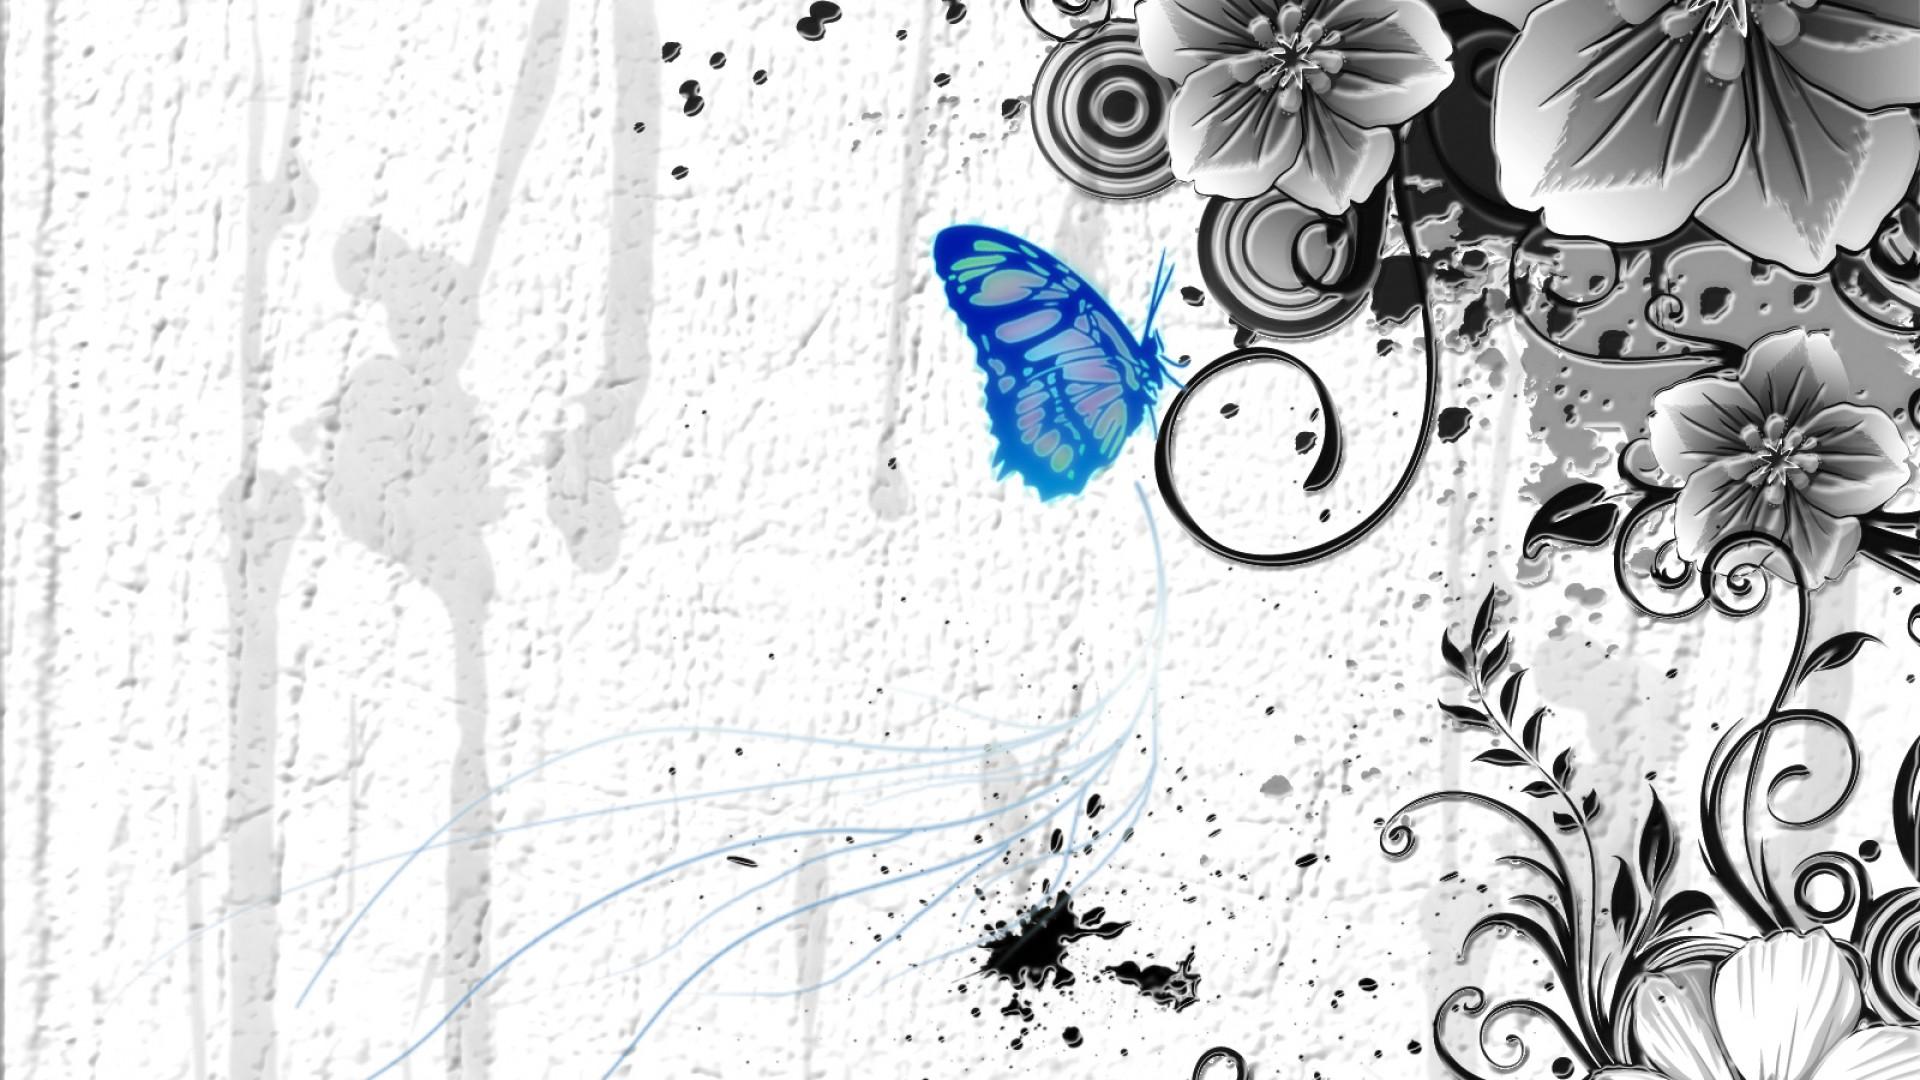 Artistic Backgrounds wallpaper 1920x1080 75328 1920x1080